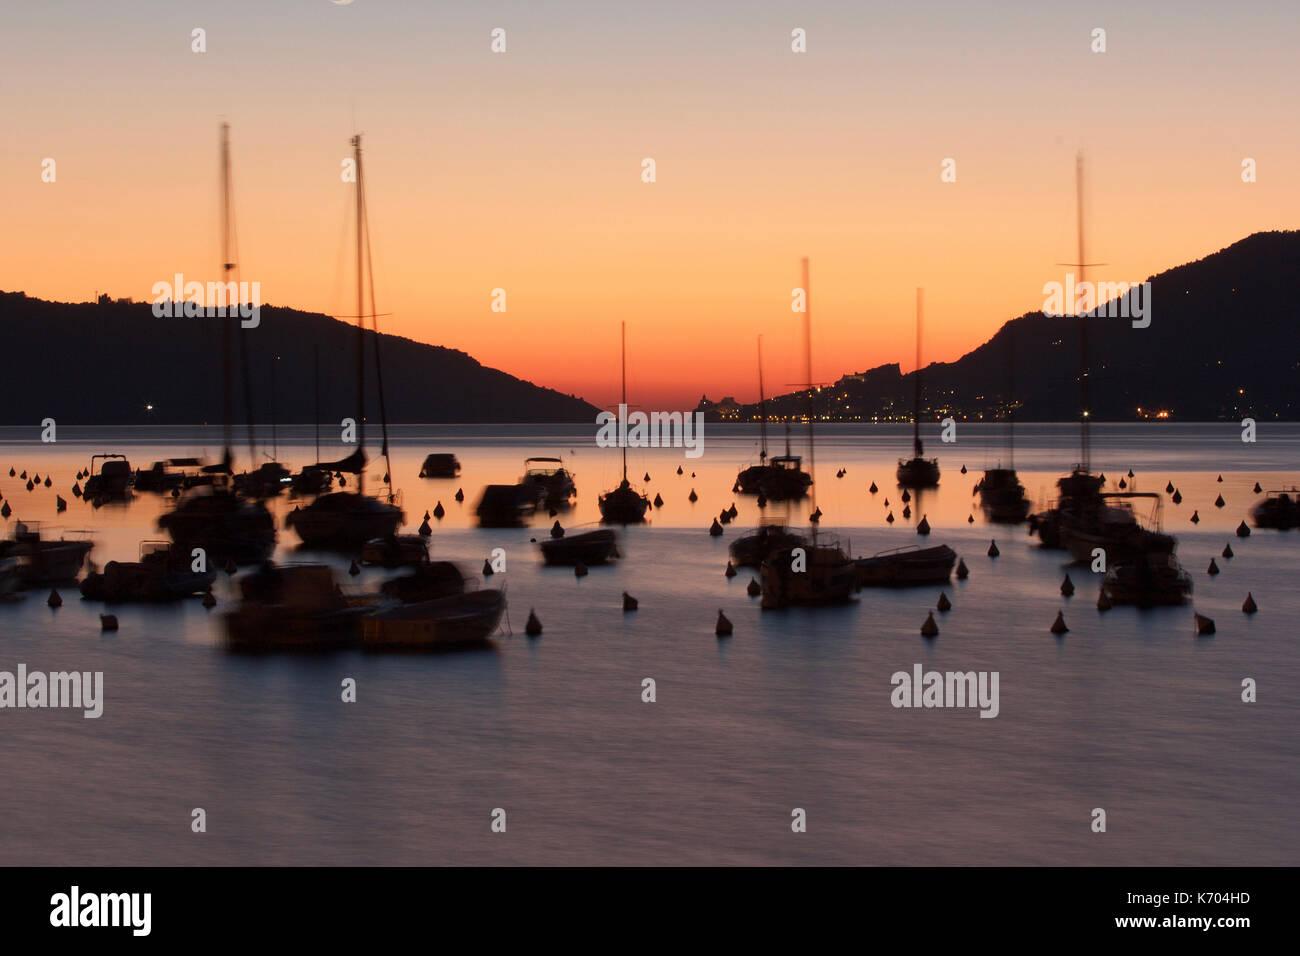 A beautiful sunset of the Lerici Harbor, Liguria, Italy, photoarkive - Stock Image